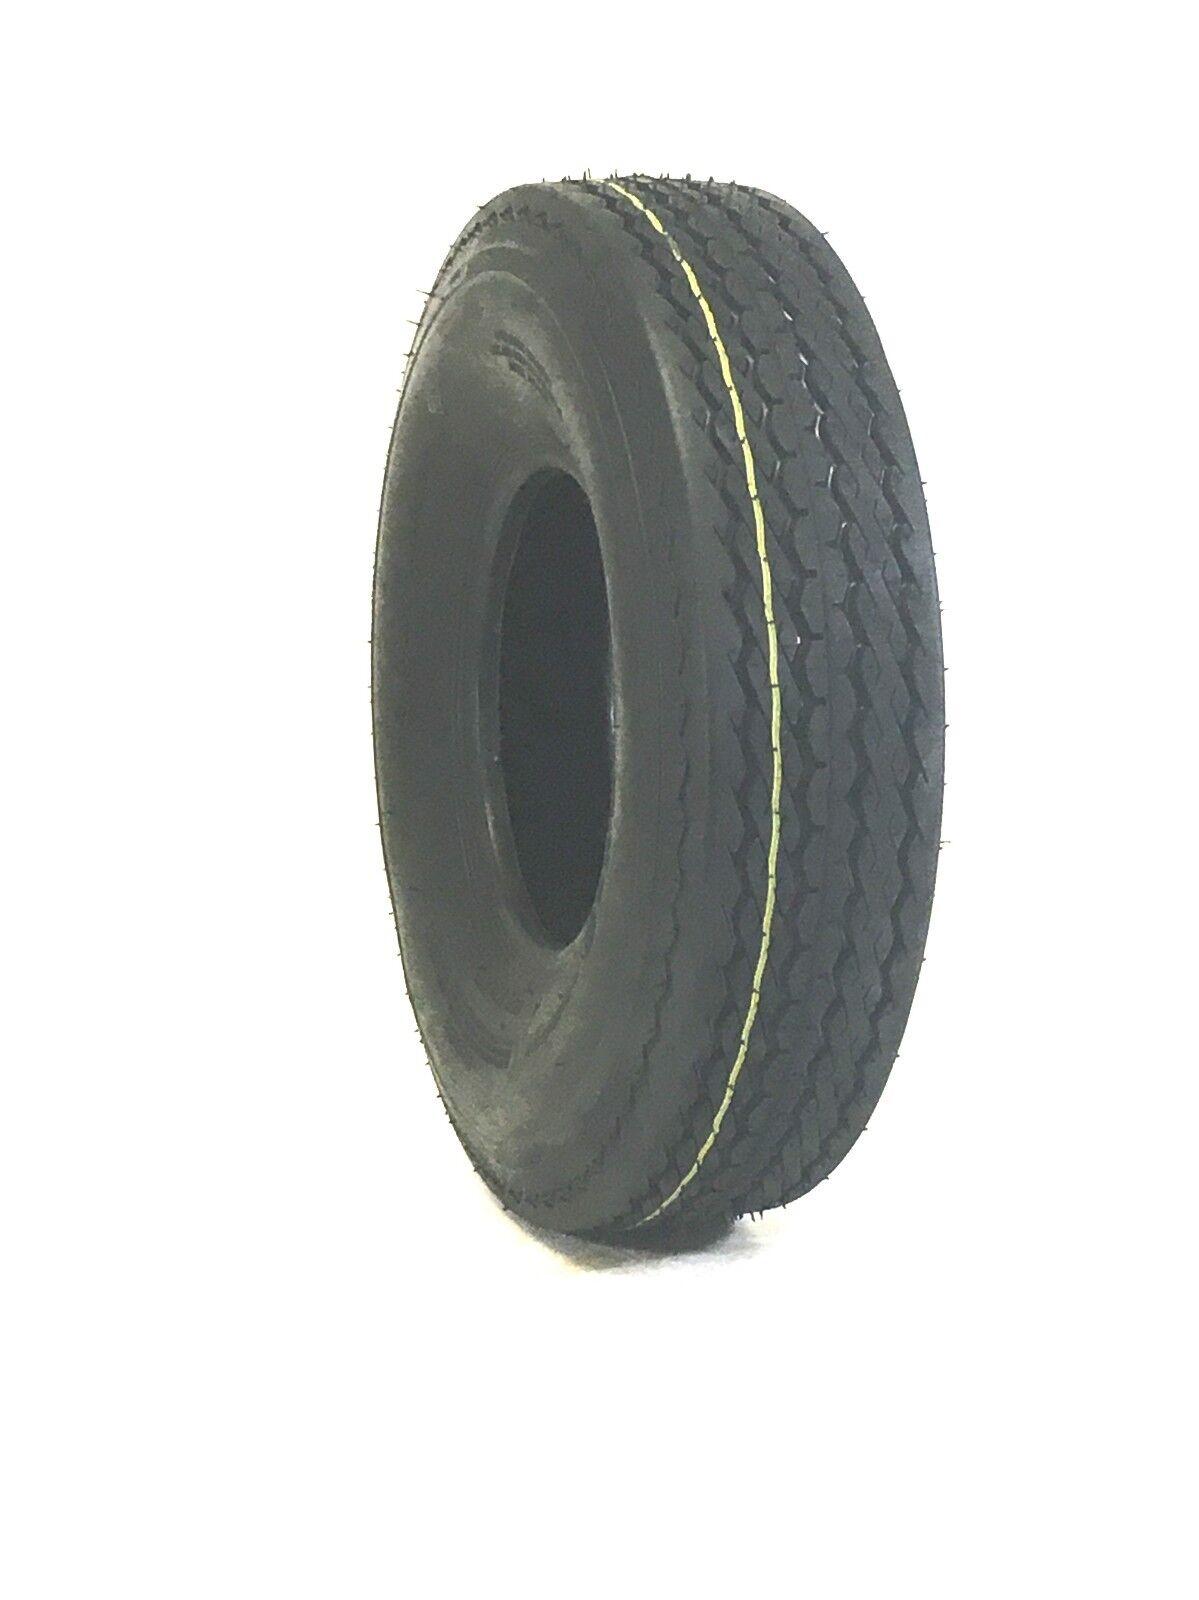 5.70-8 6 Ply Cushman Replacement Hi-Speed Trailer Tires 5.70x8